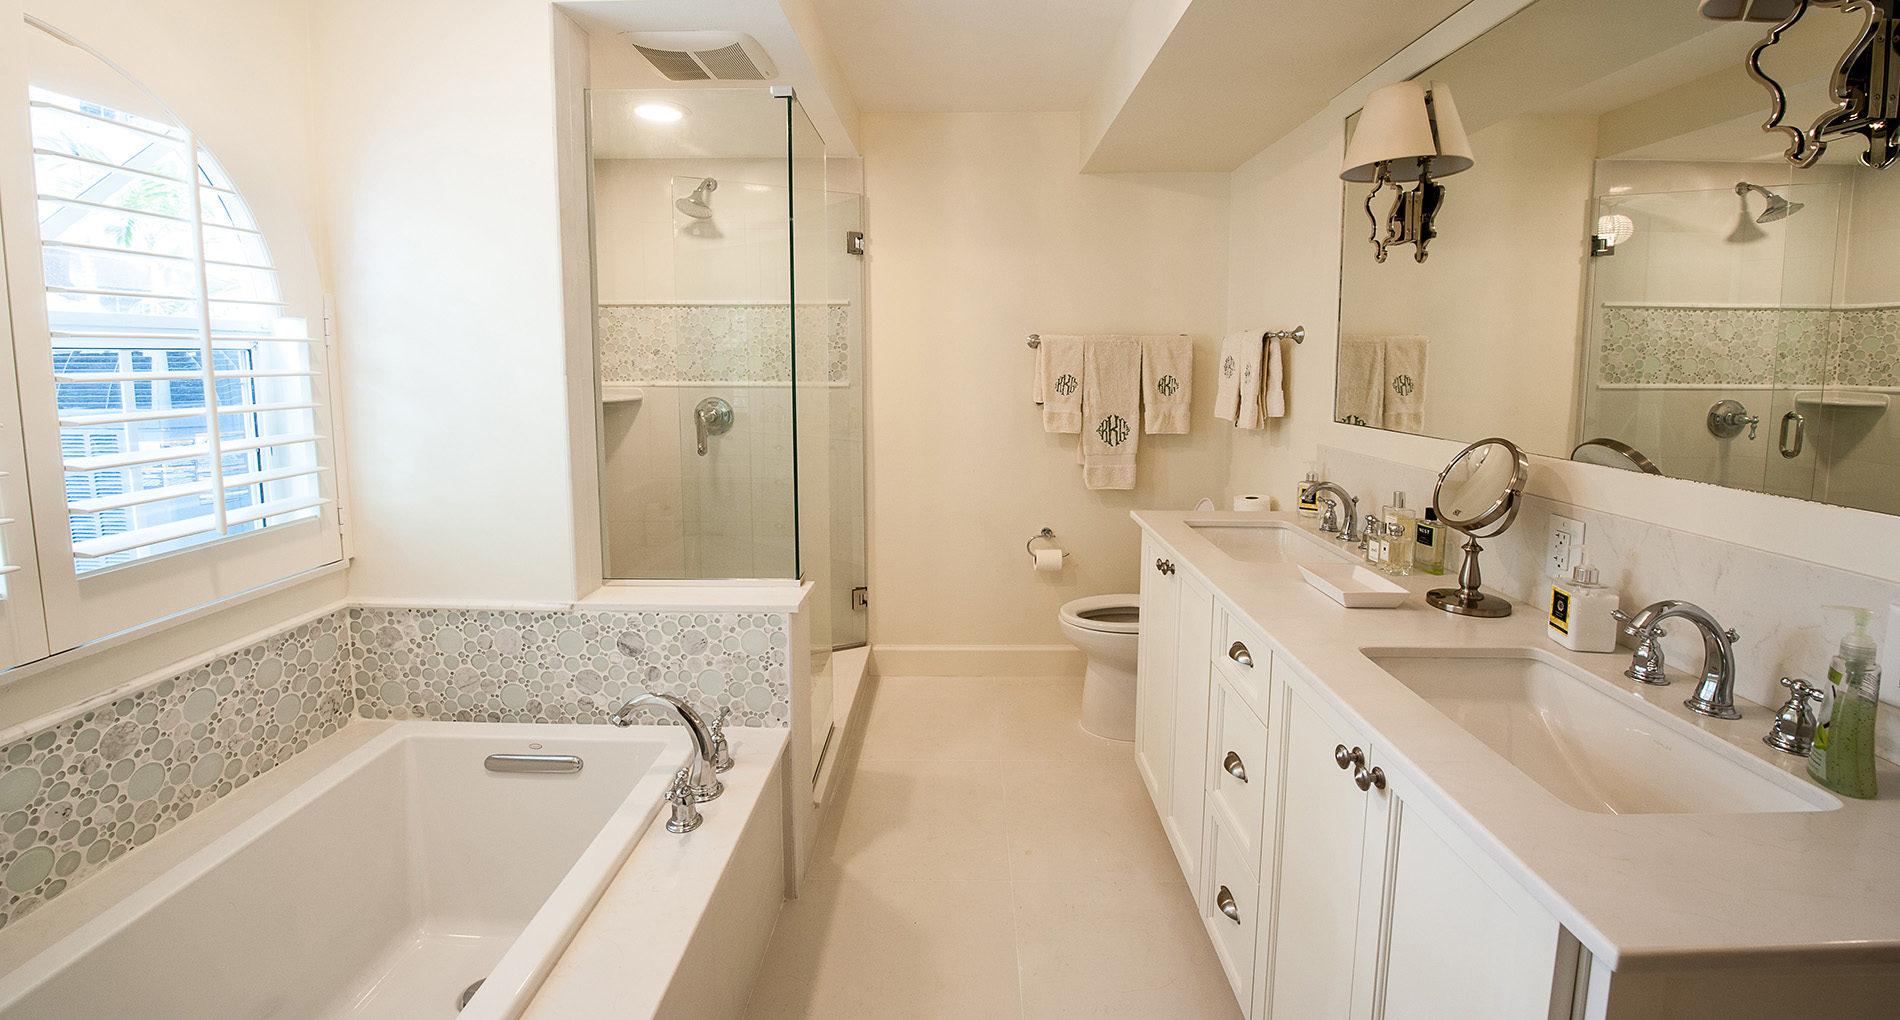 Bathroom Remodel Bonitasprings Naplescondo Slider